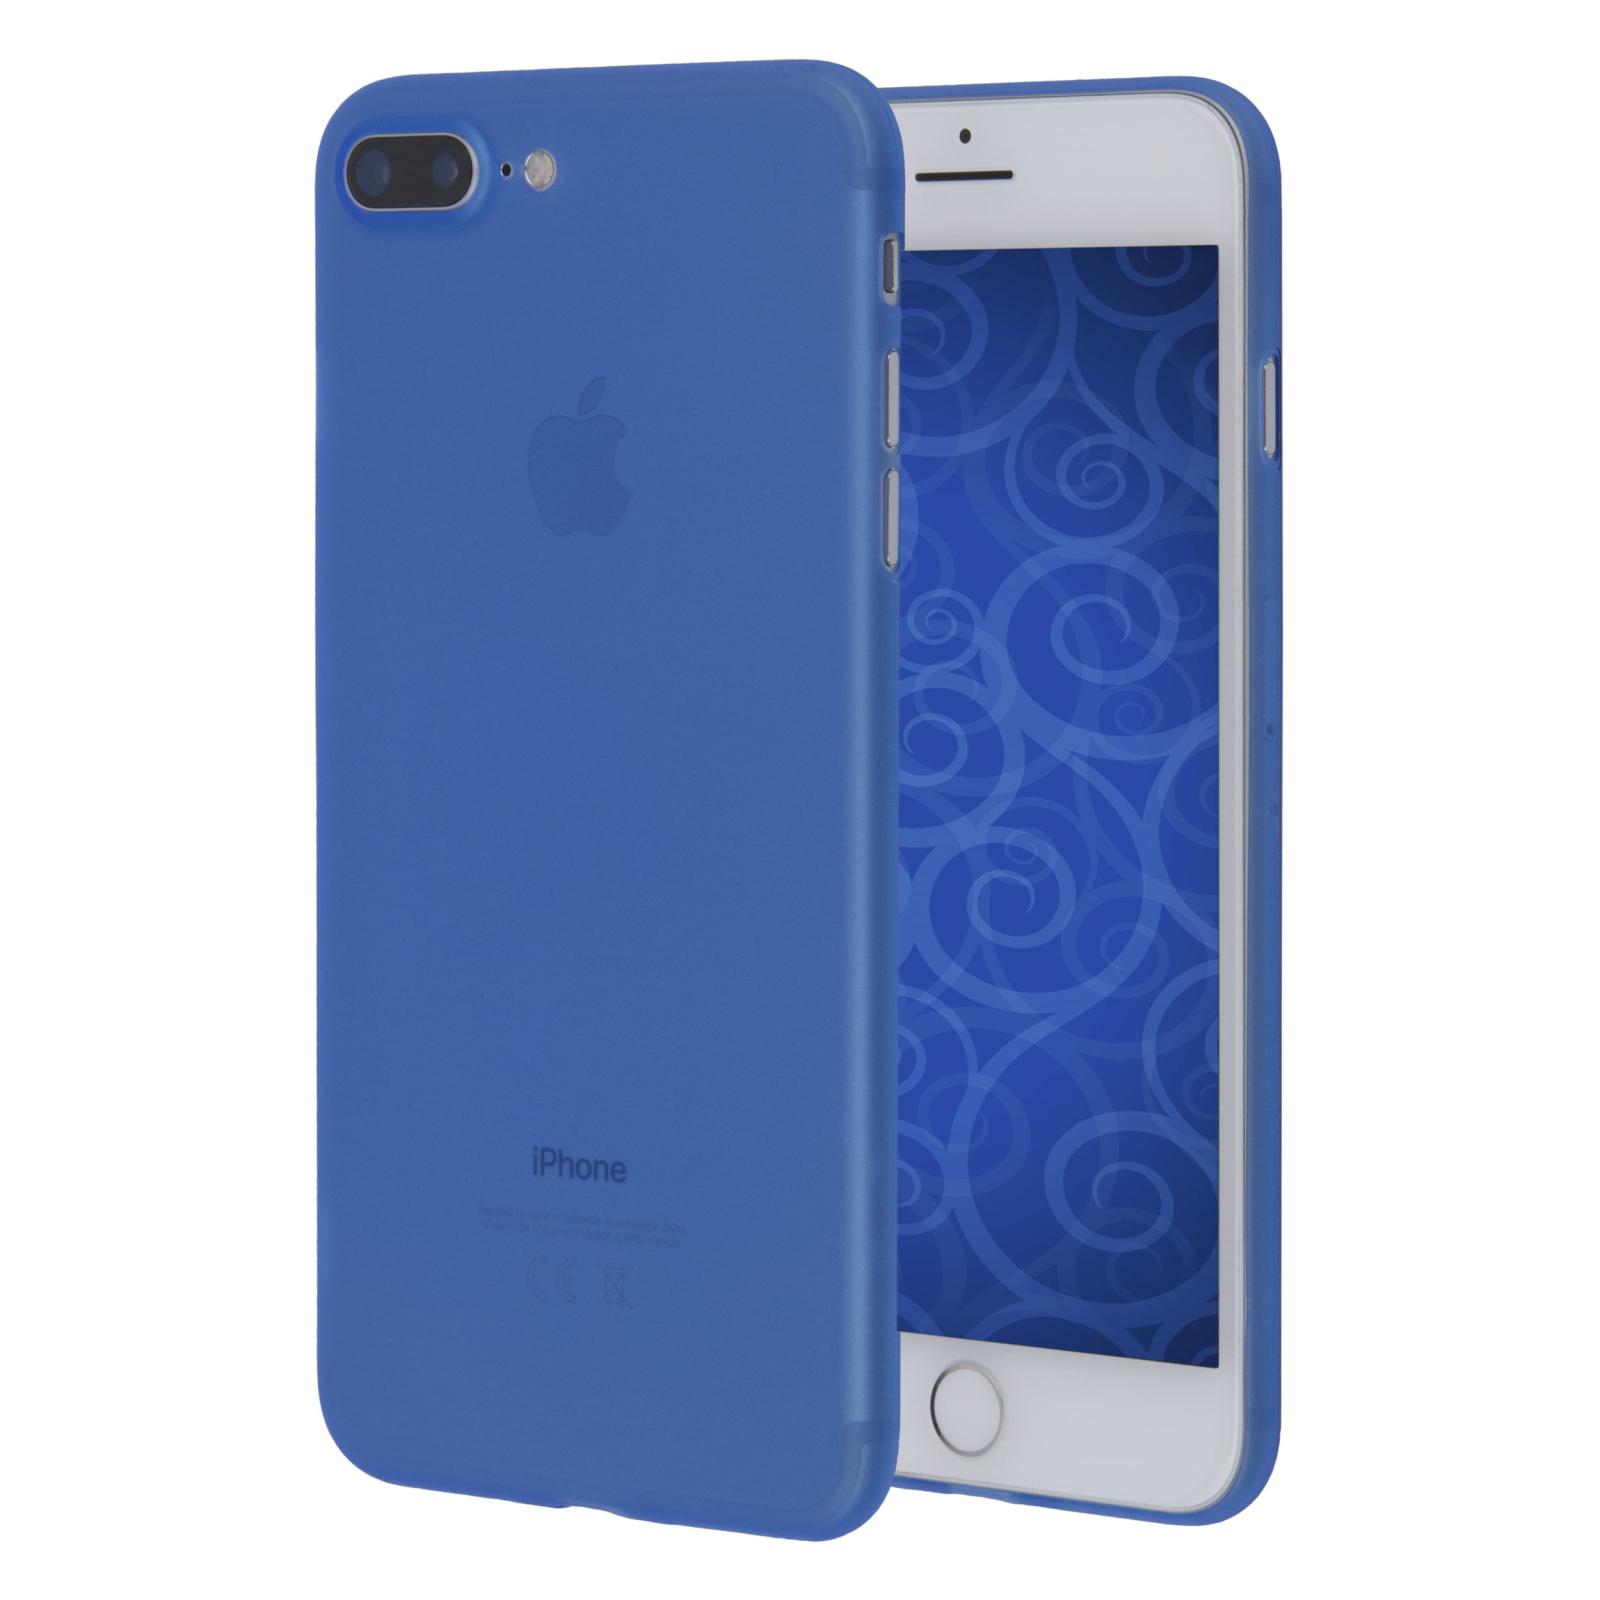 Чехол для моб. телефона MakeFuture PP/Ice Case для Apple iPhone 7 Plus Blue (MCI-AI7PBL) изображение 2